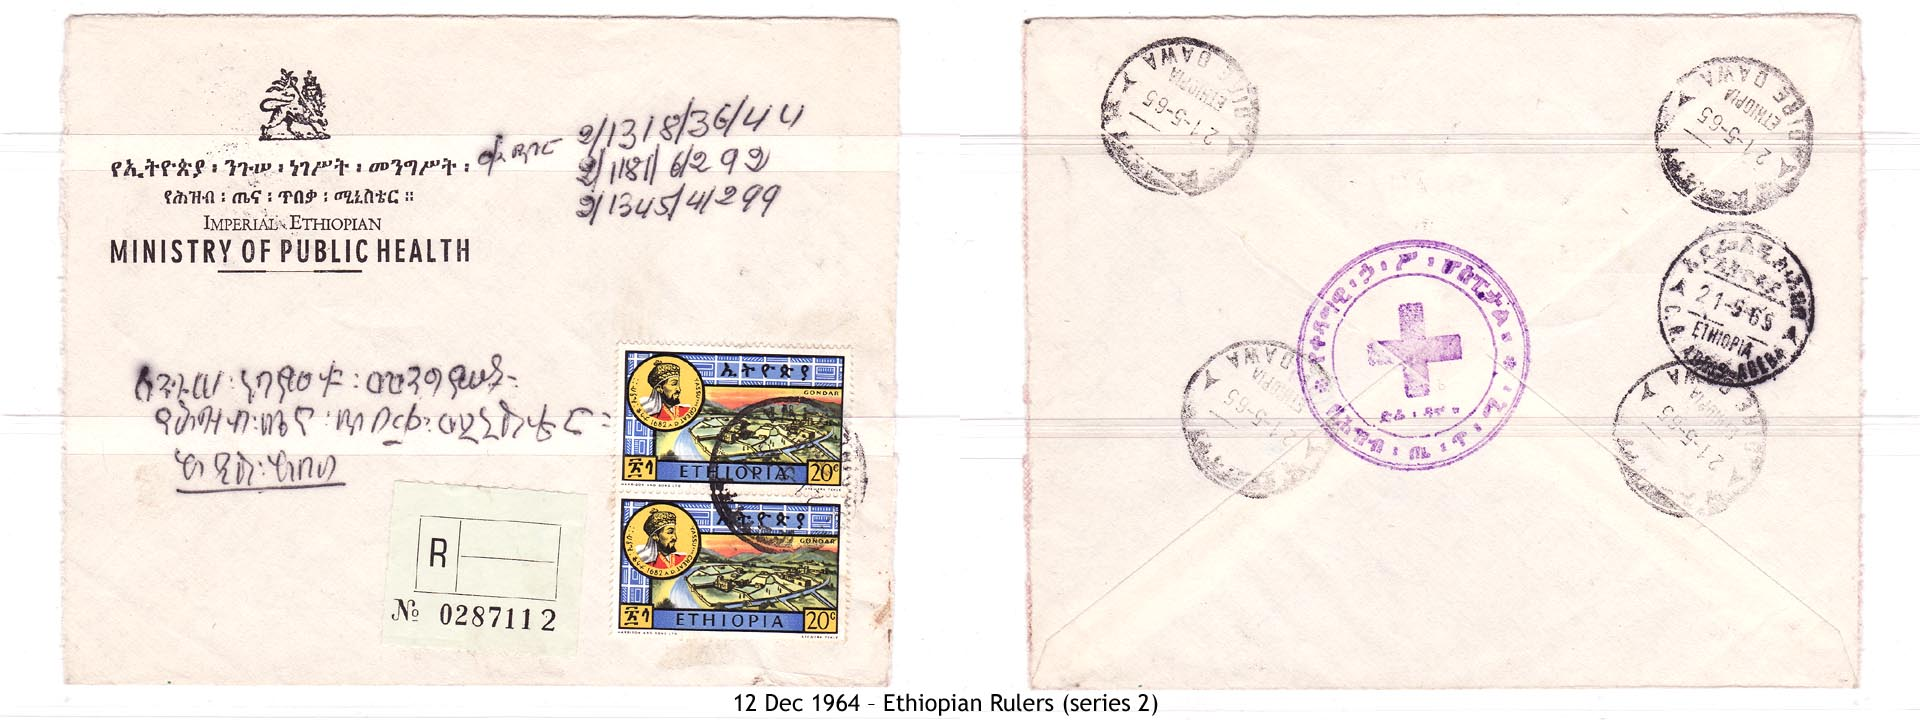 19641212 – Ethiopian Rulers (series 2)